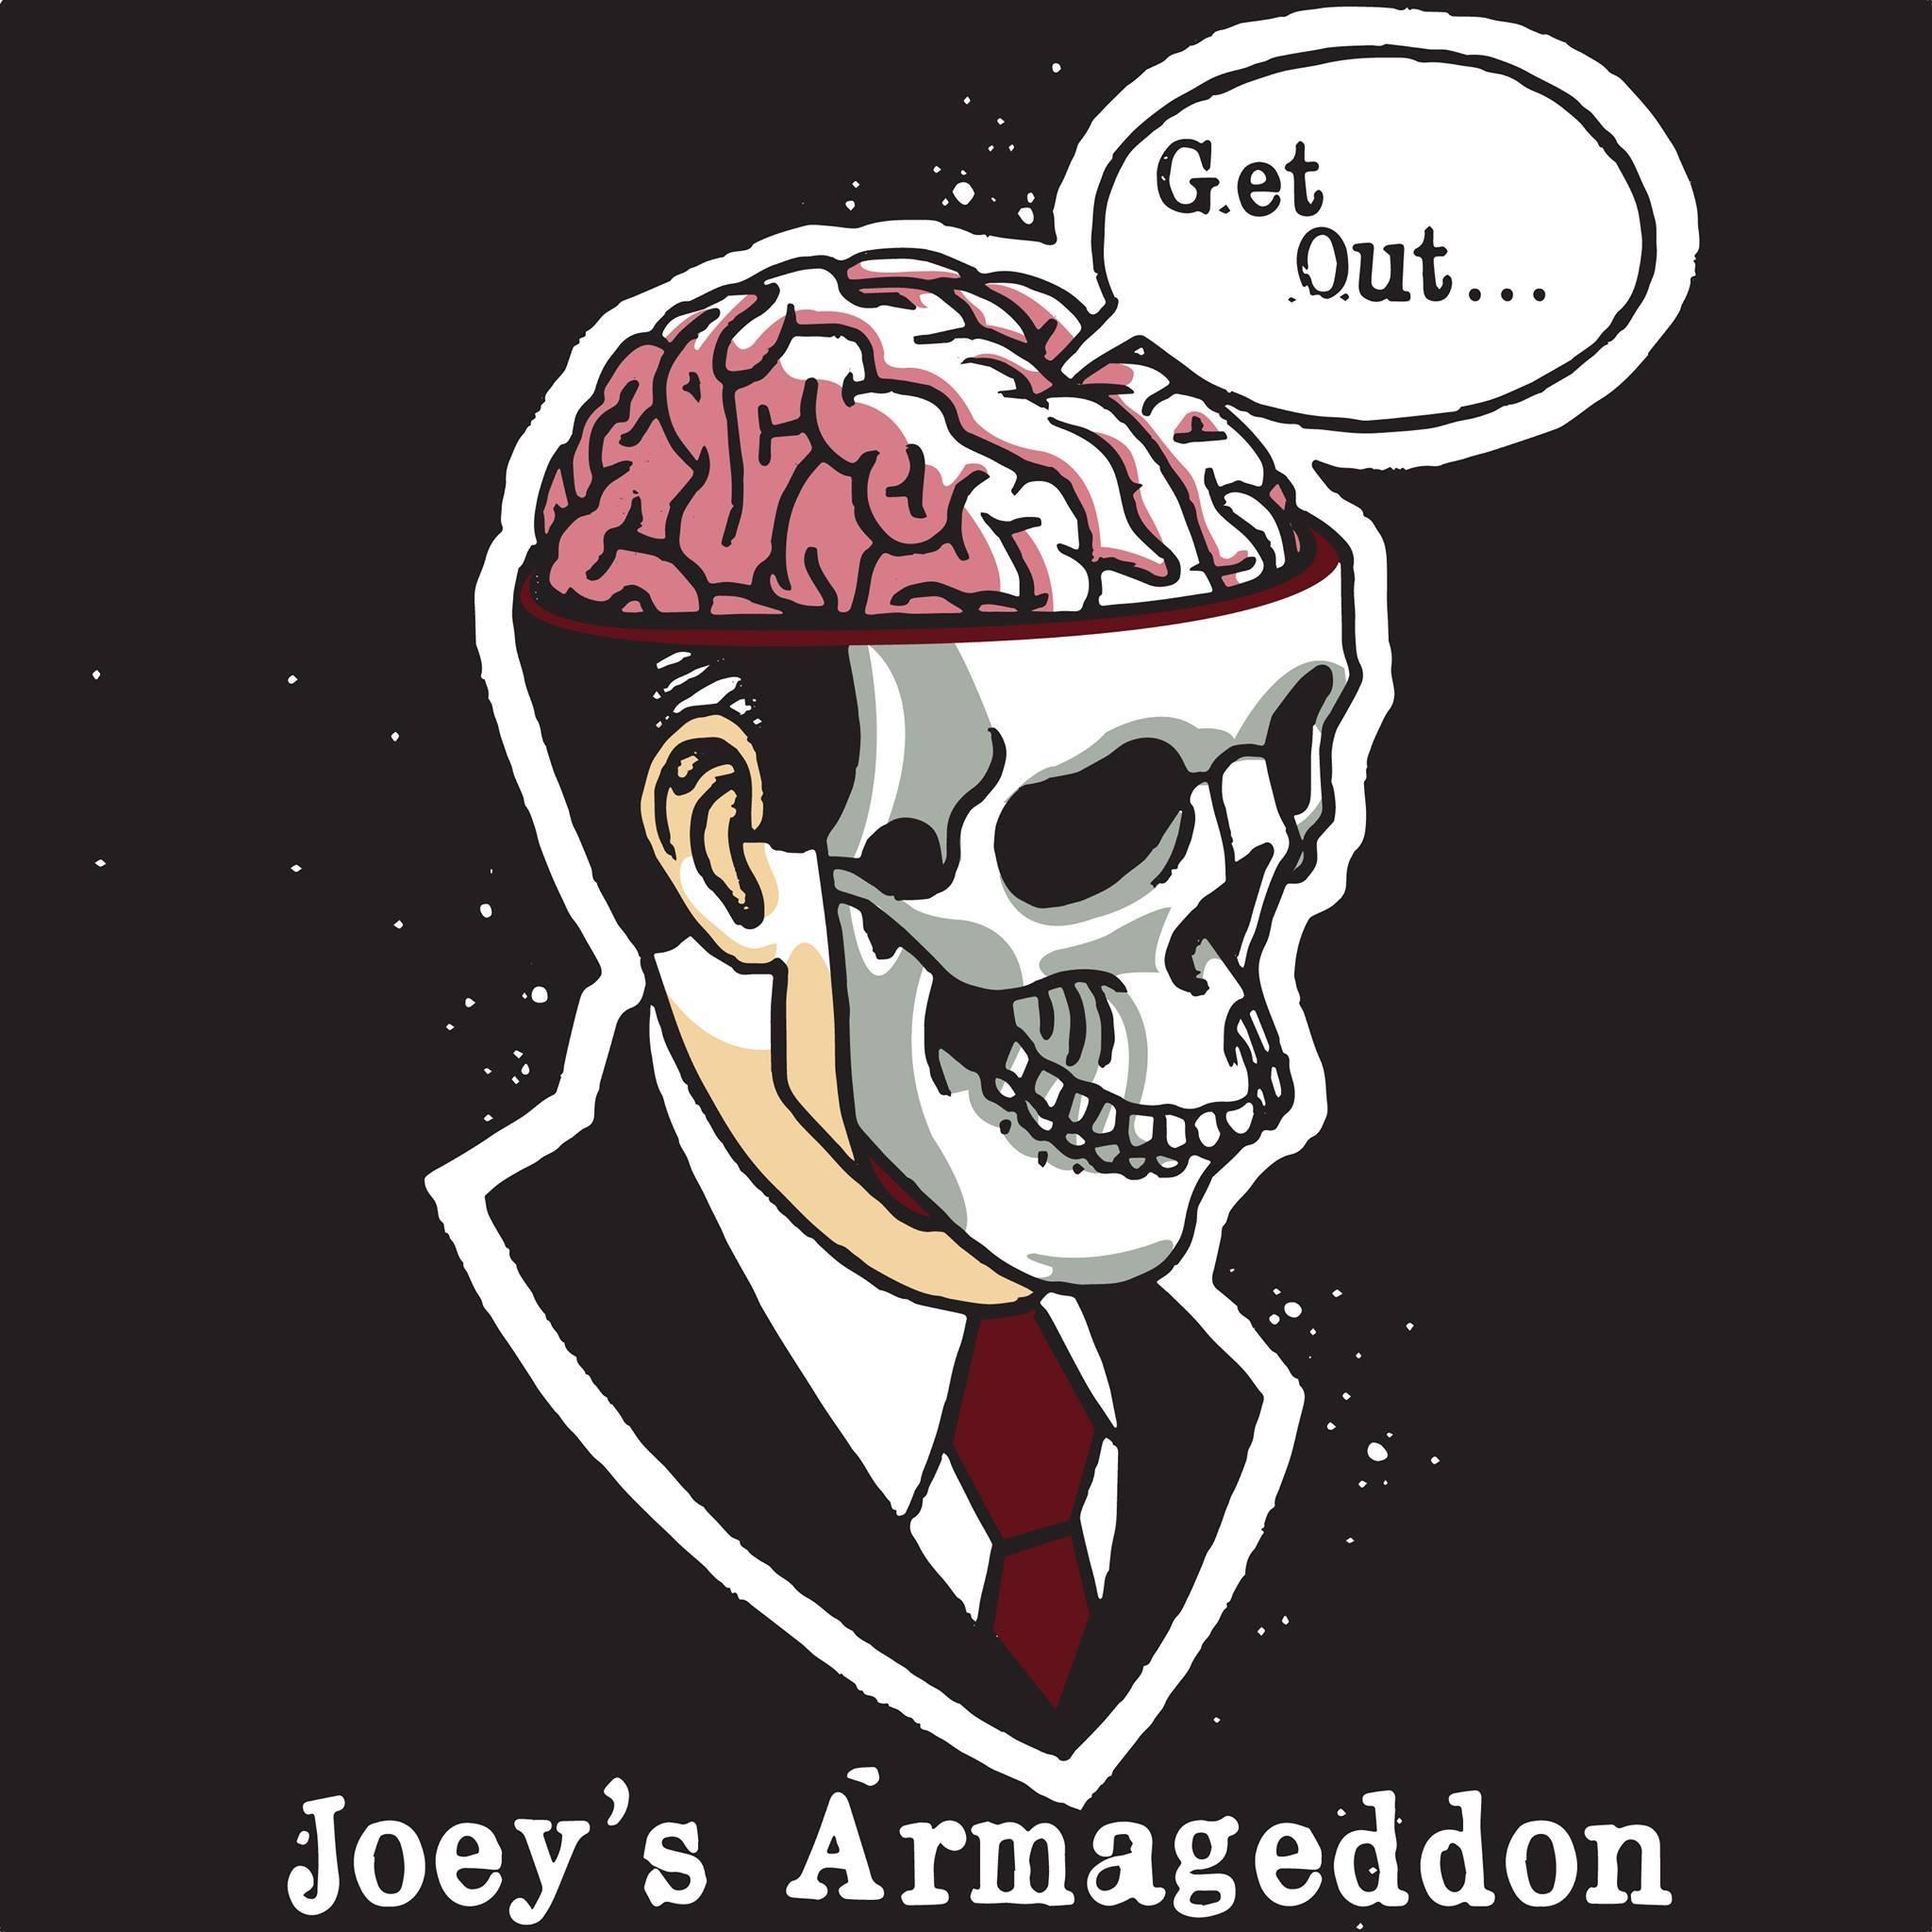 Joey's Armagedon & Frenemy